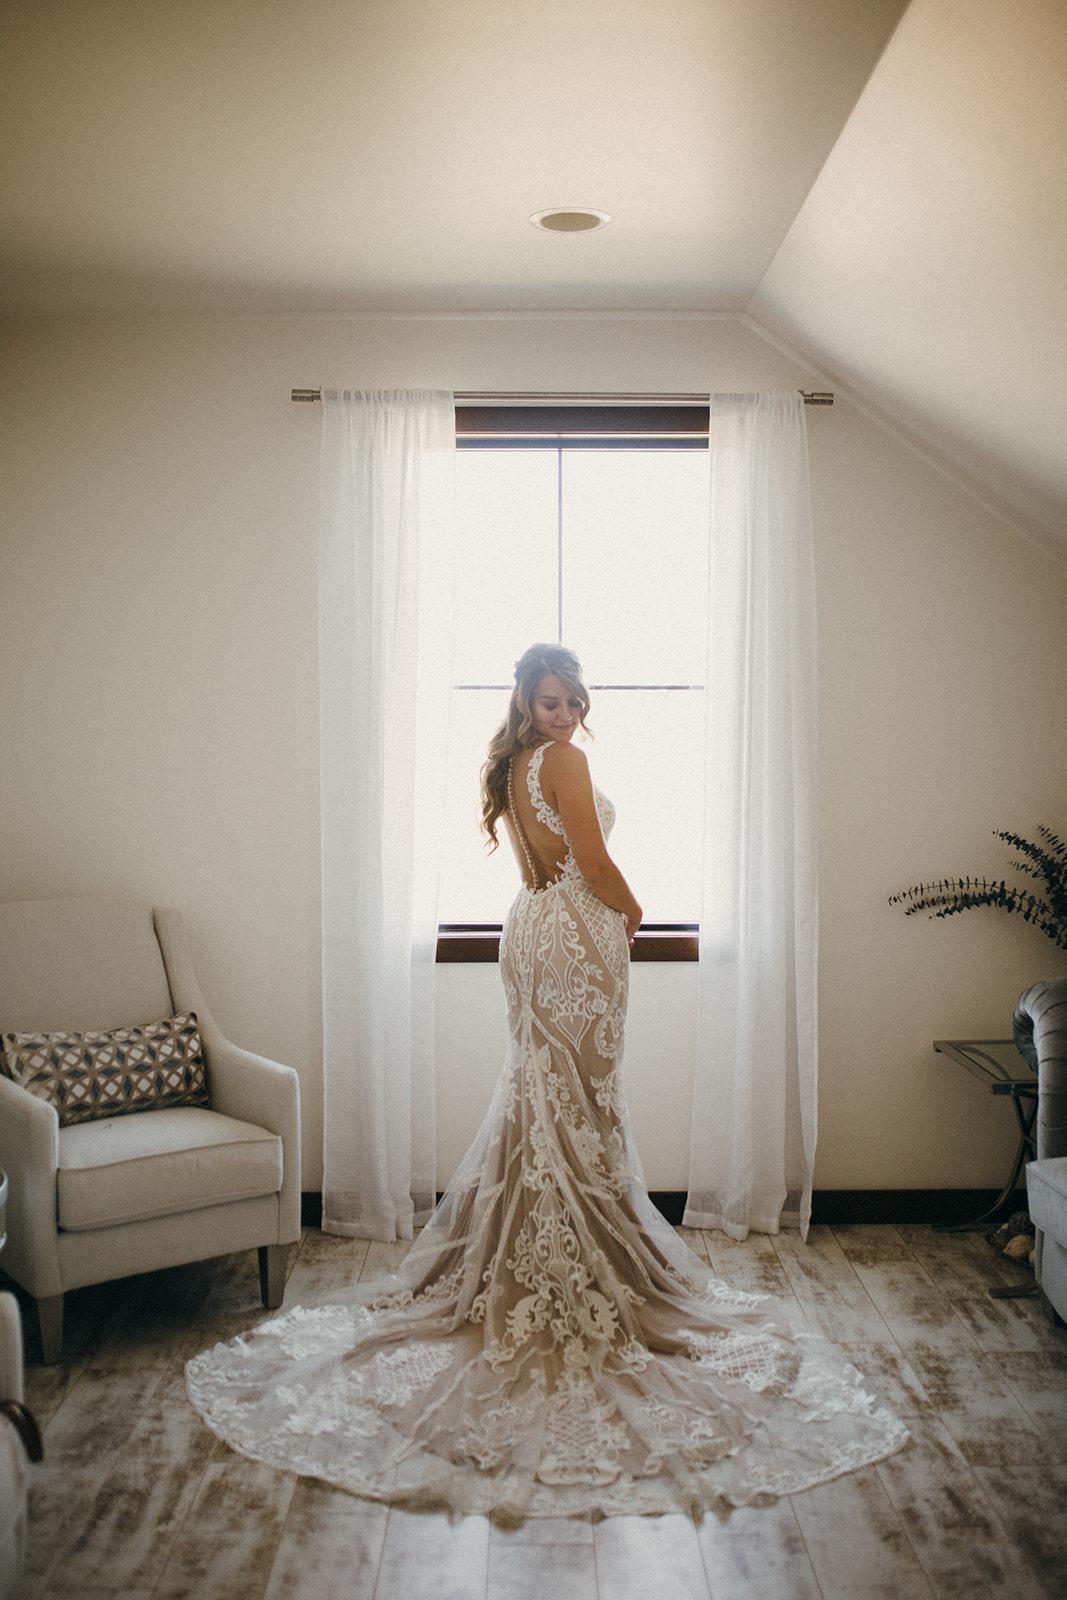 kaden_justine_wedding_0365.jpg